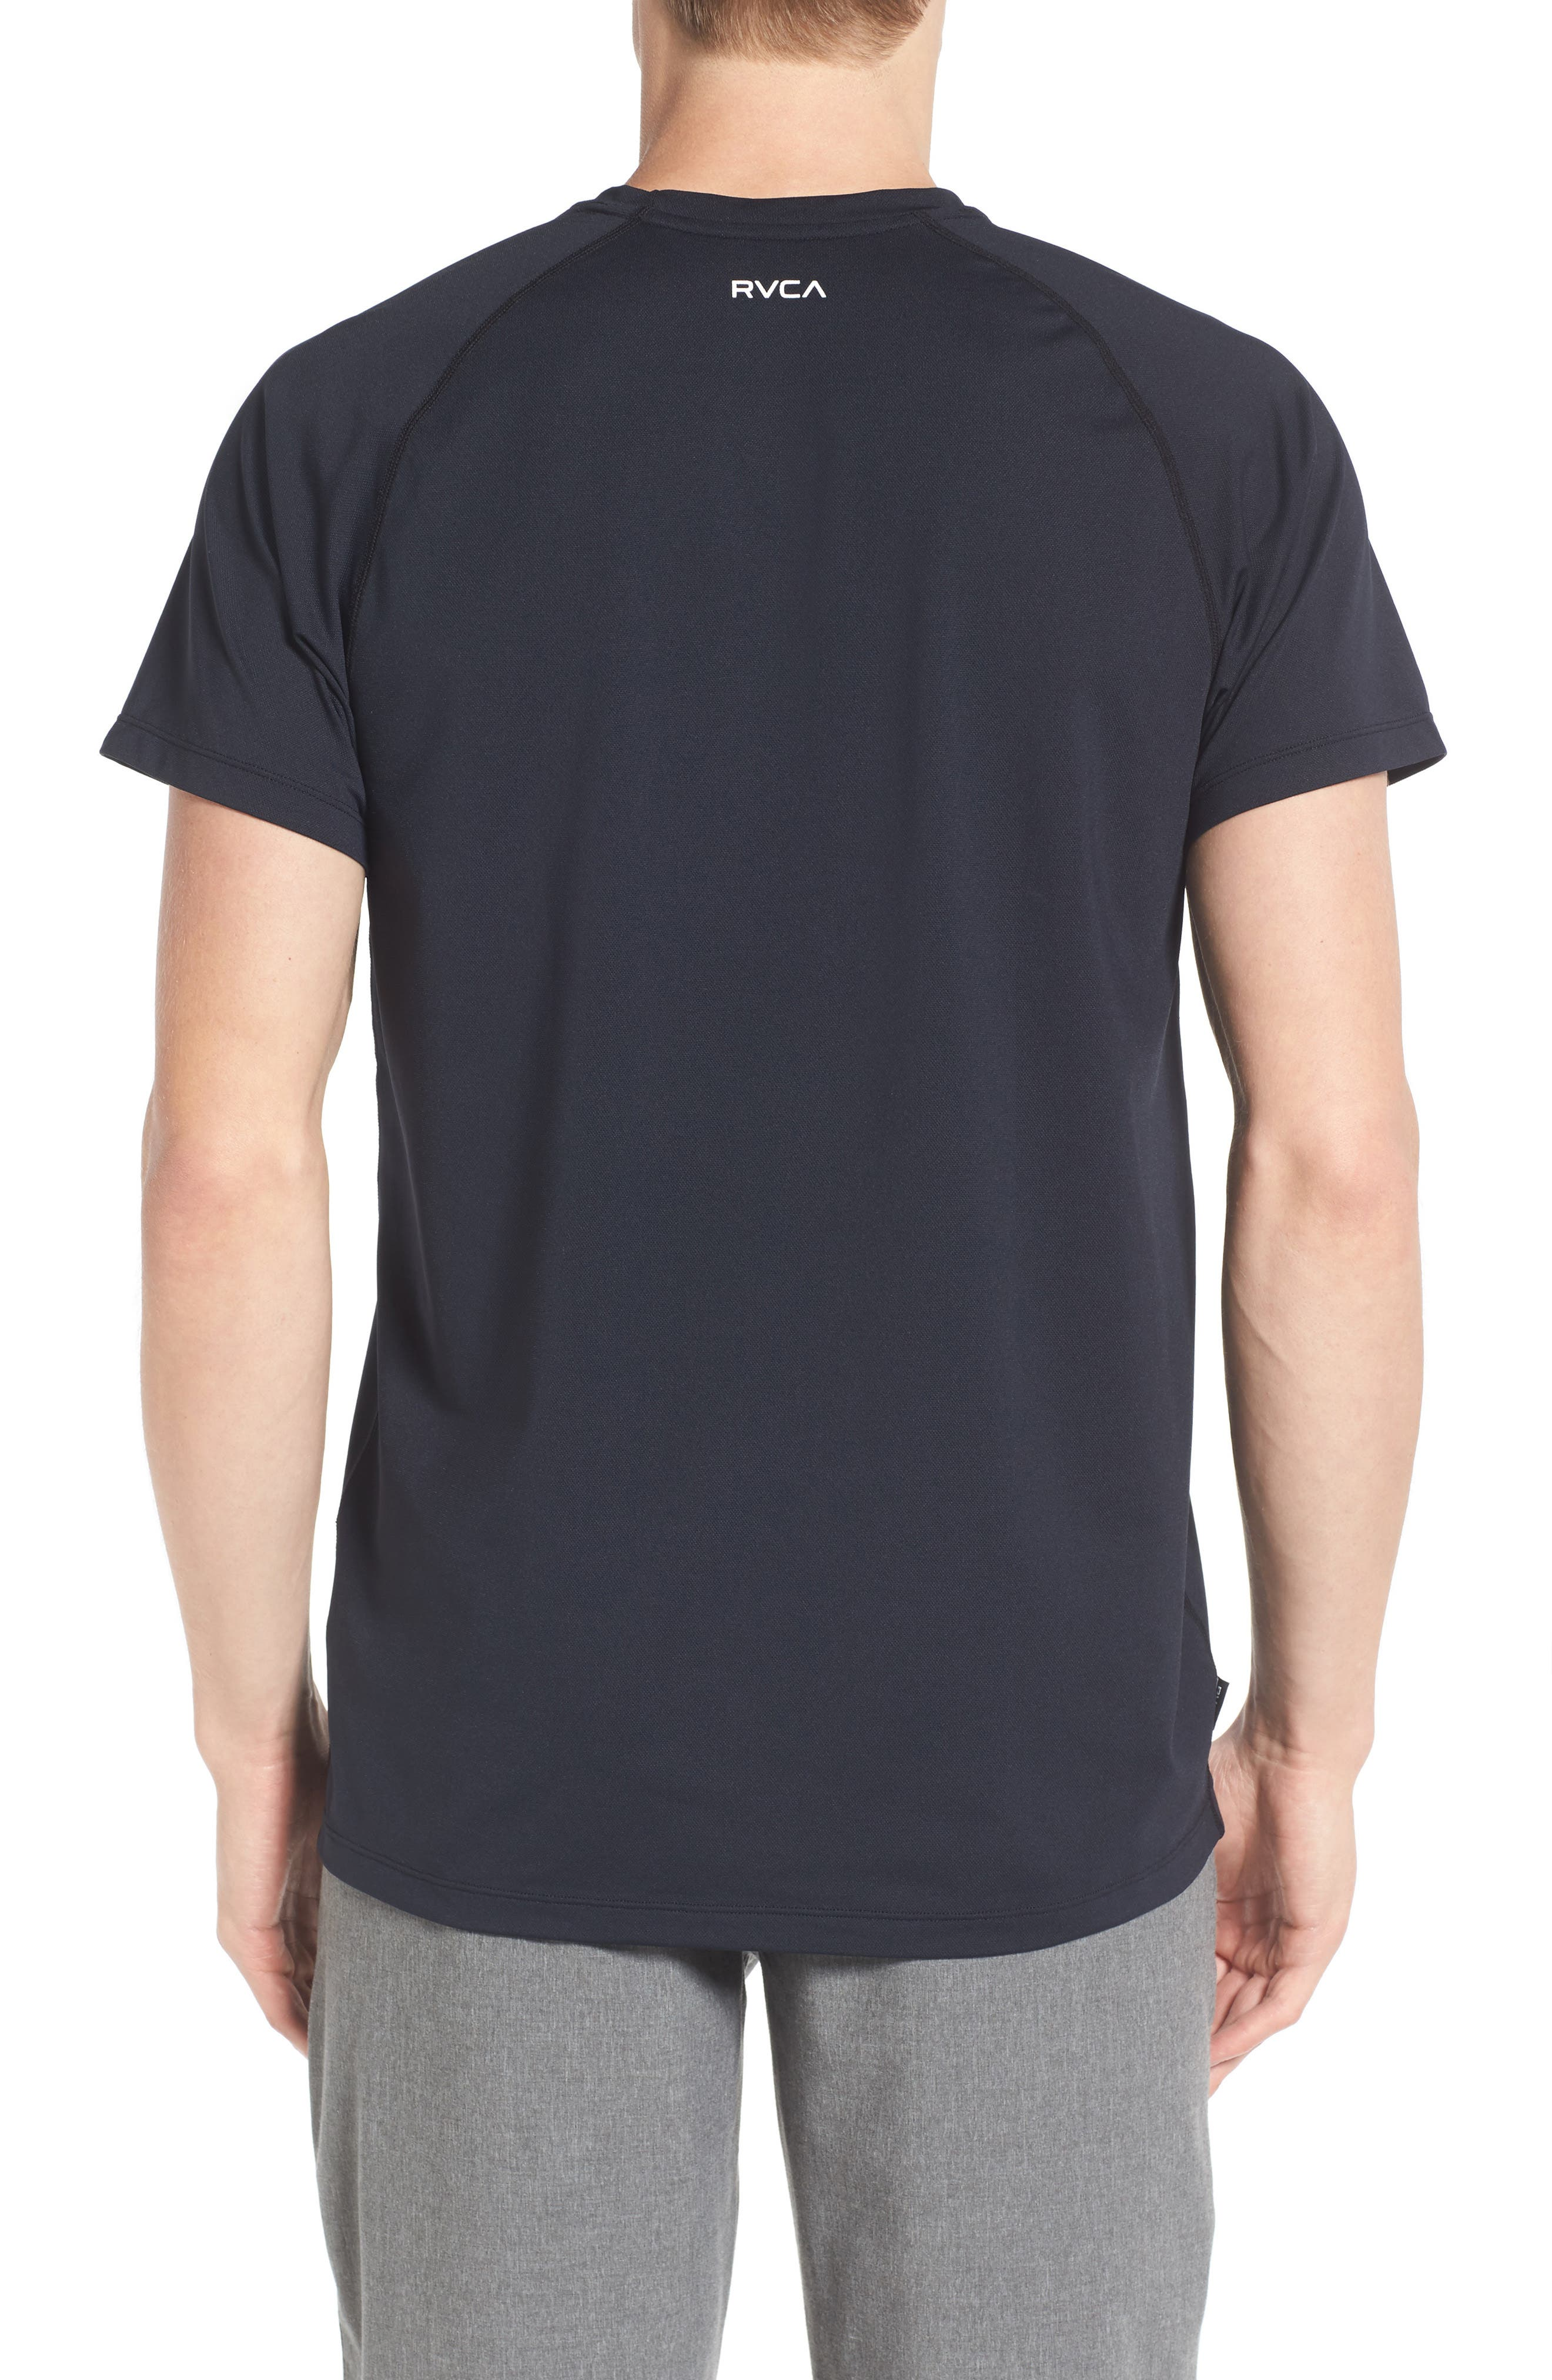 VA All the Way Surf T-Shirt,                             Alternate thumbnail 2, color,                             Black